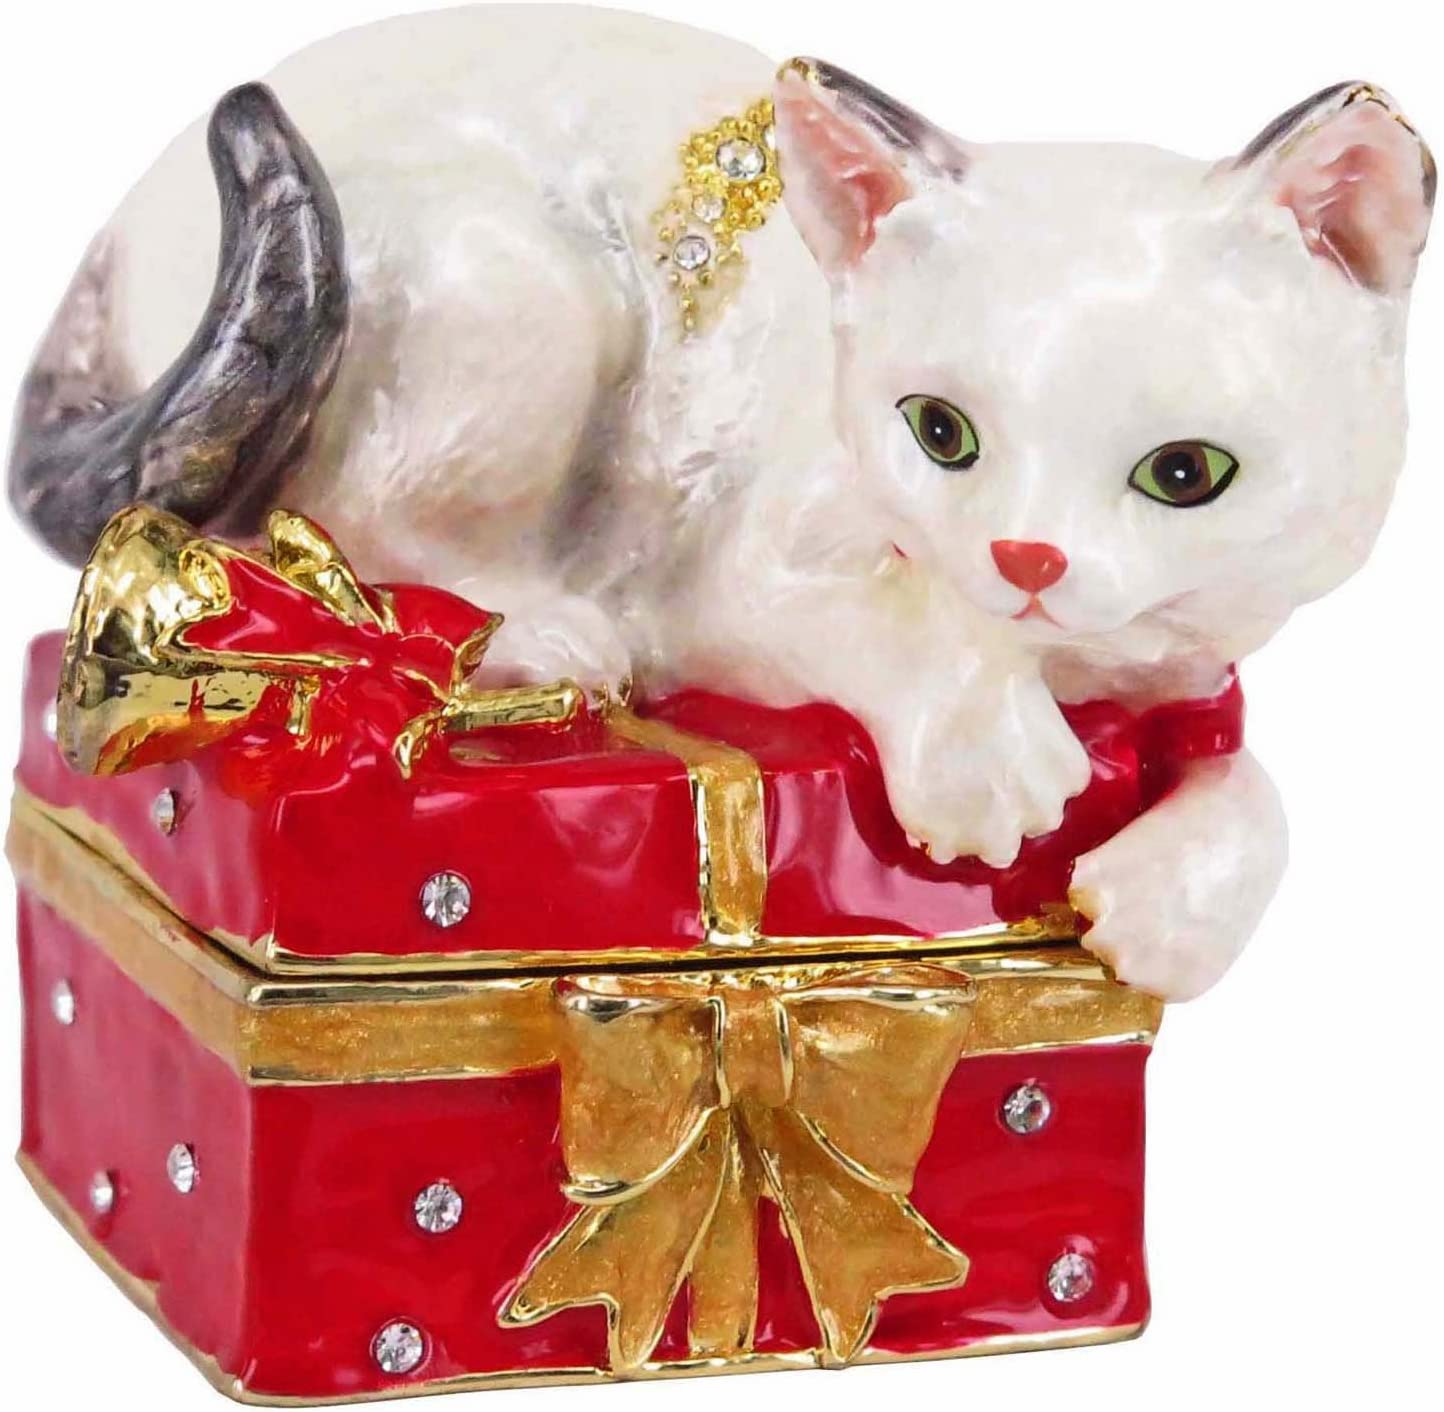 RUCINNI Kitty Jeweled Trinket Crystals 別倉庫からの配送 with スピード対応 全国送料無料 Box Swarovski